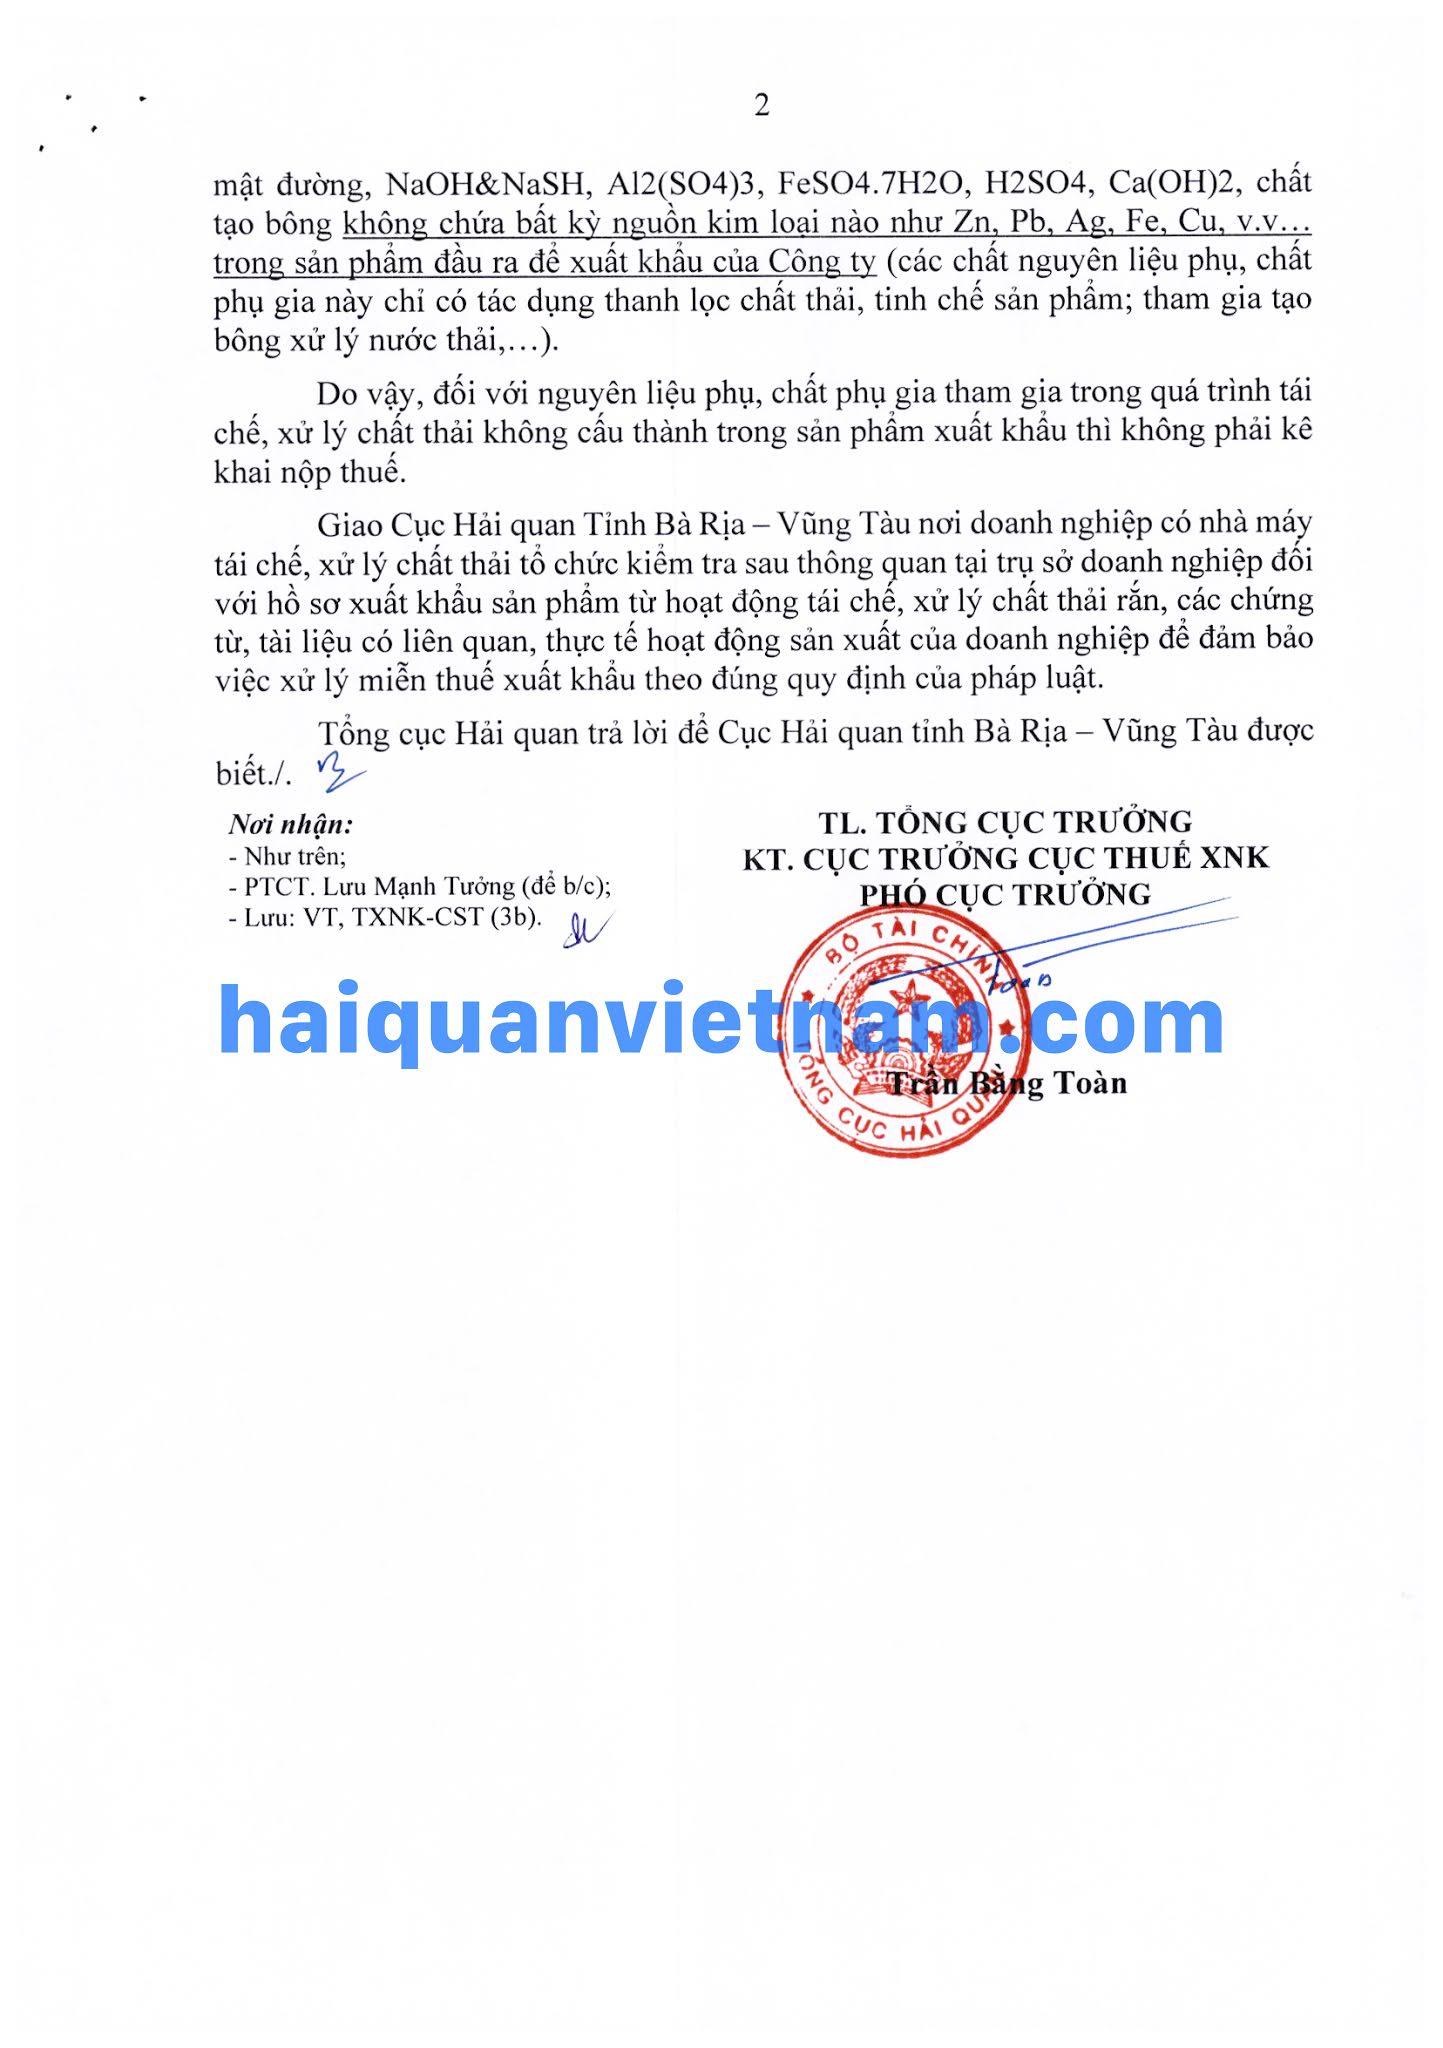 [Image: 210622_3153_TCHQ-TXNK_haiquanvietnam_02.jpg]